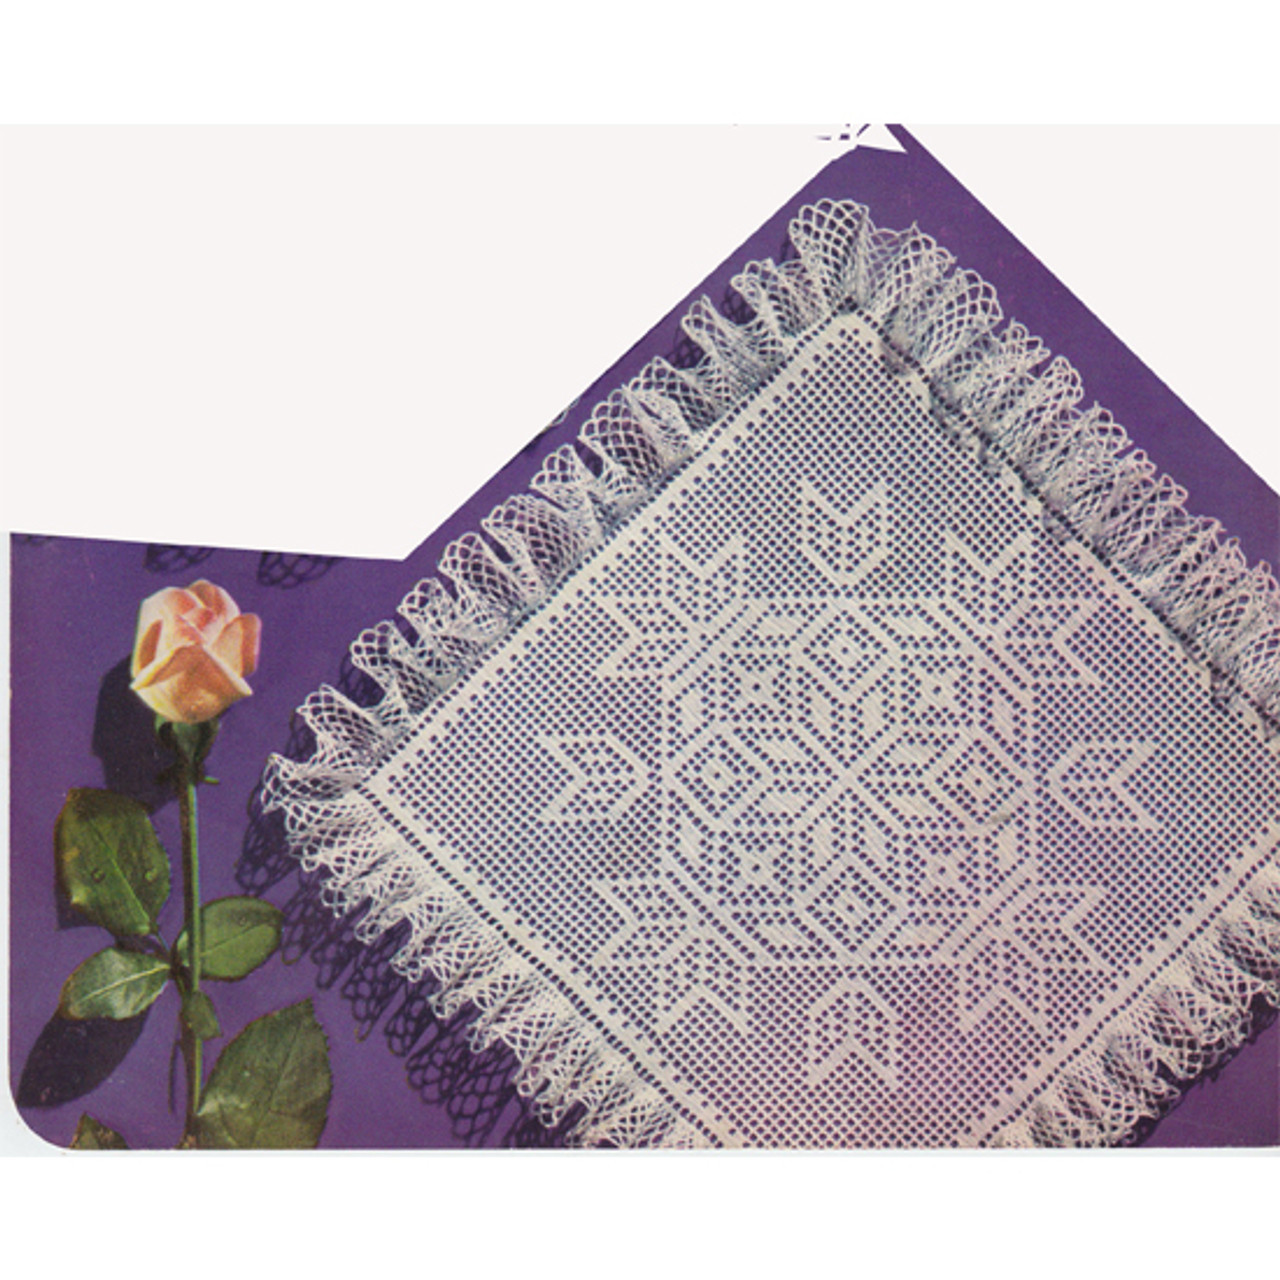 Ruffled Mosaic Filet Crochet Doily Pattern